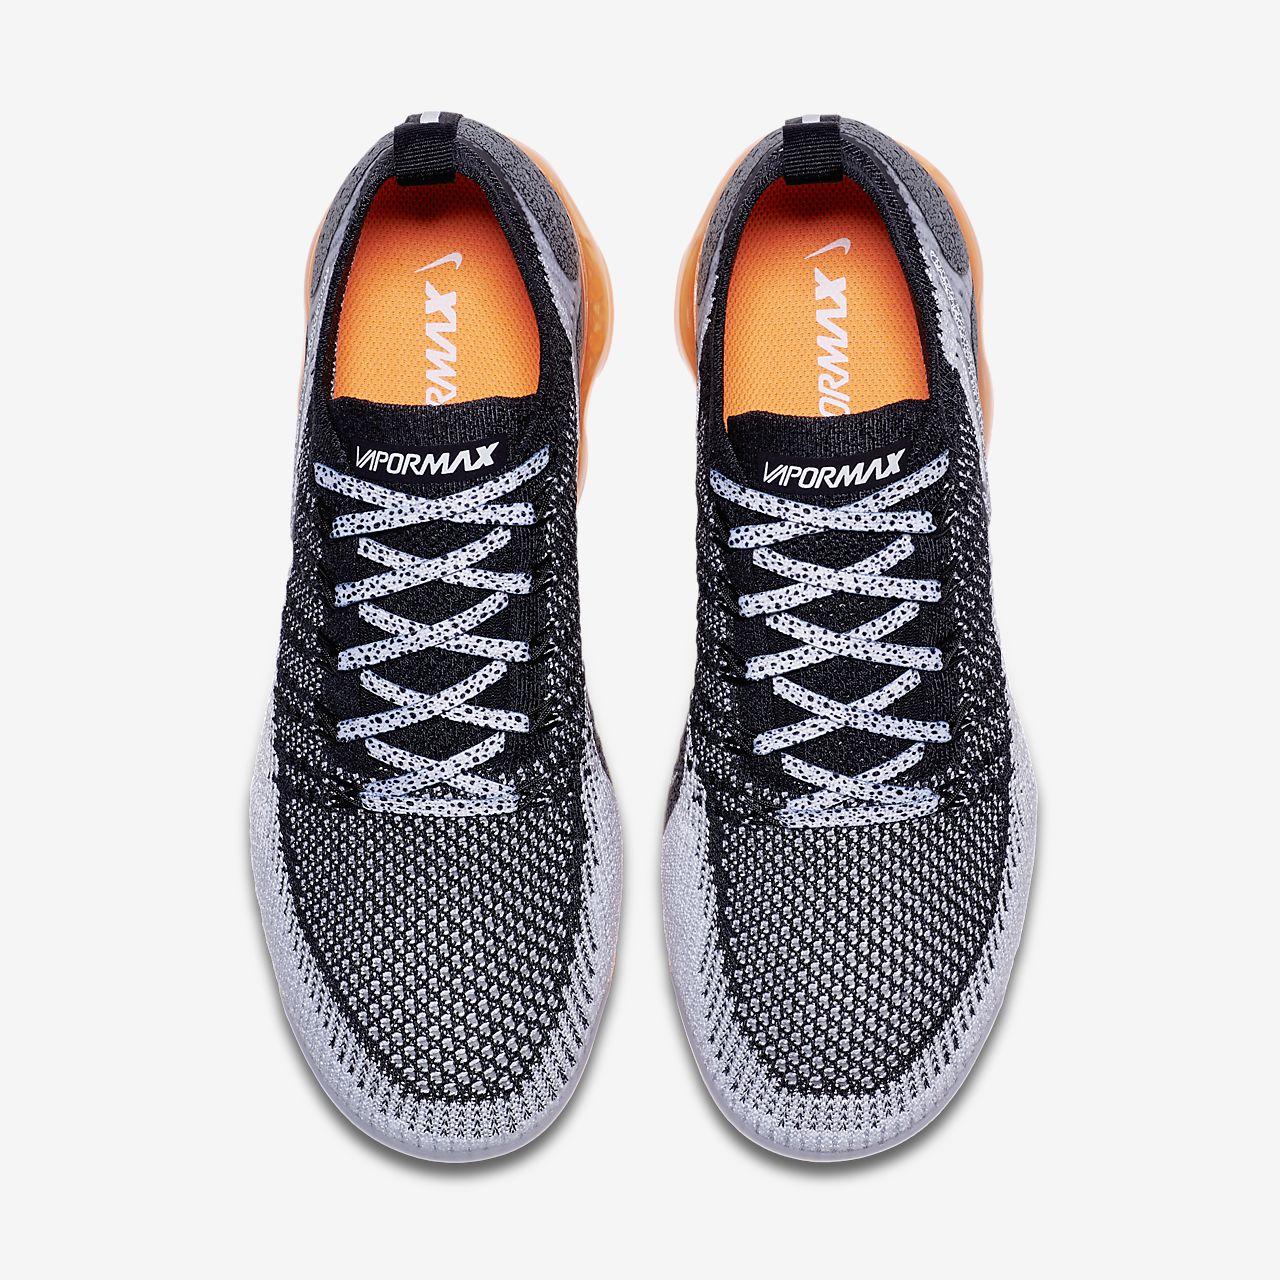 more photos 35e8e 2a601 ... Chaussure Nike Air VaporMax Flyknit 2 Safari